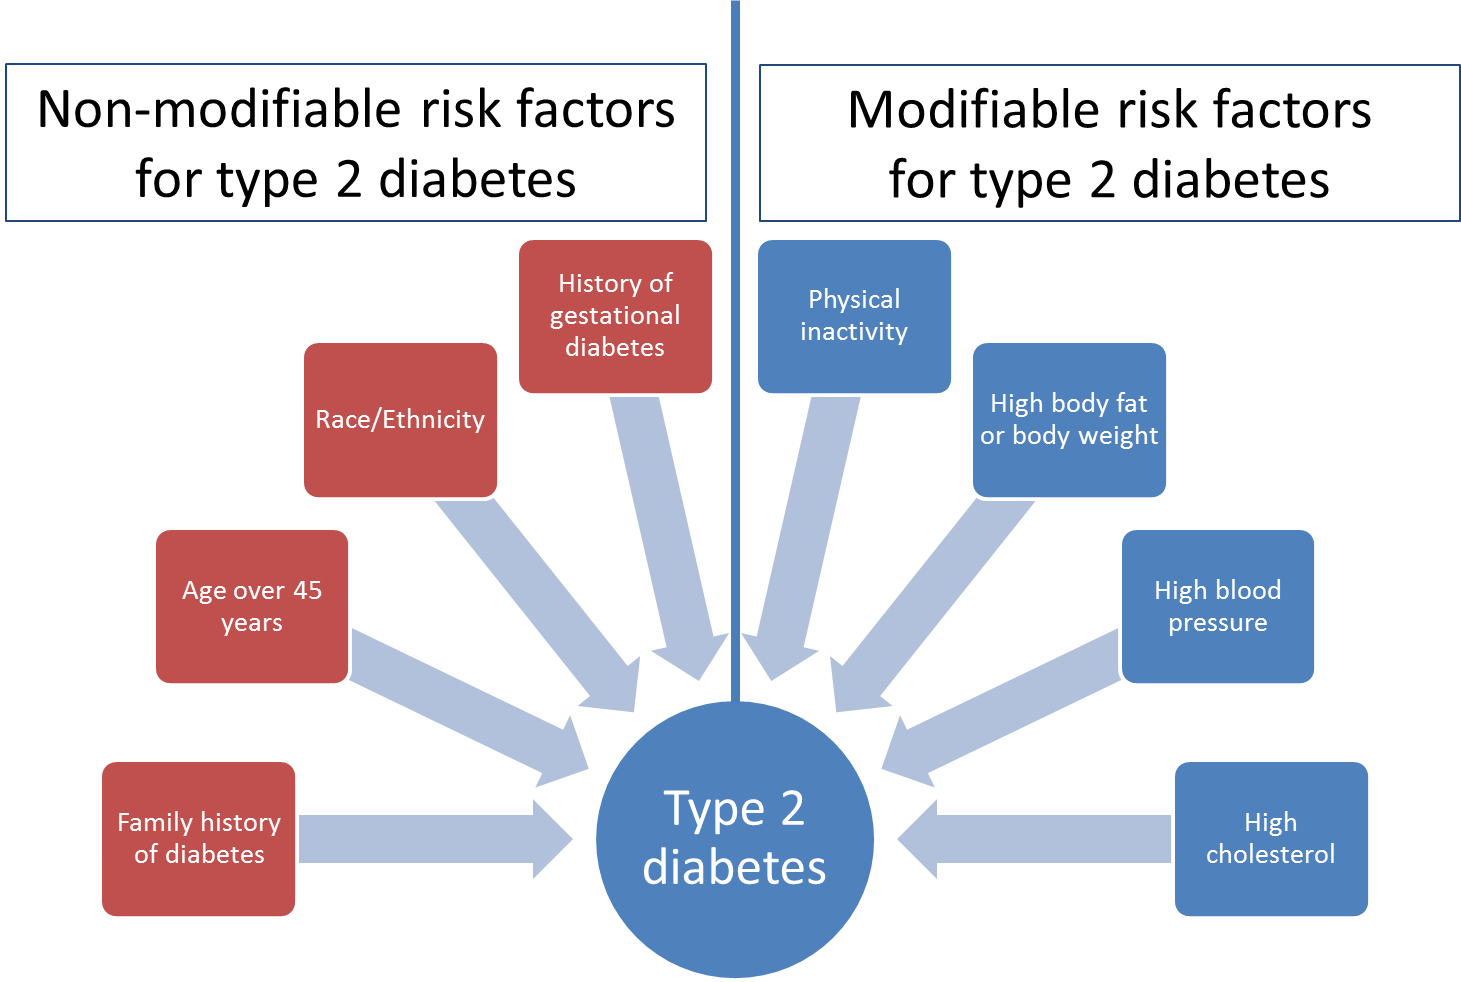 Watch Risk Factors for Type 2 Diabetes video